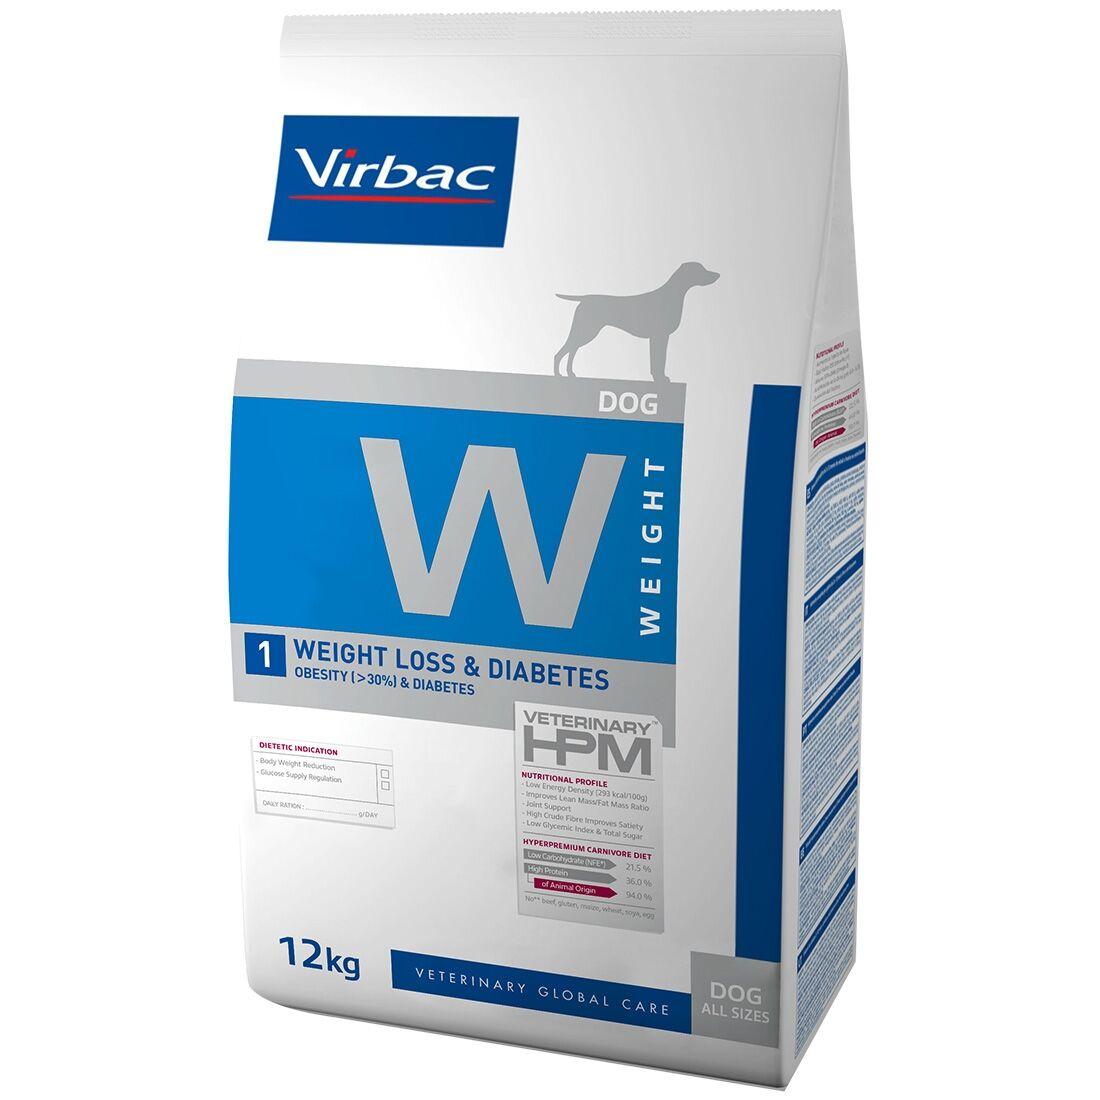 Virbac Veterinary HPM Weight Loss & Diabetes Dog Contenance : 12 kg